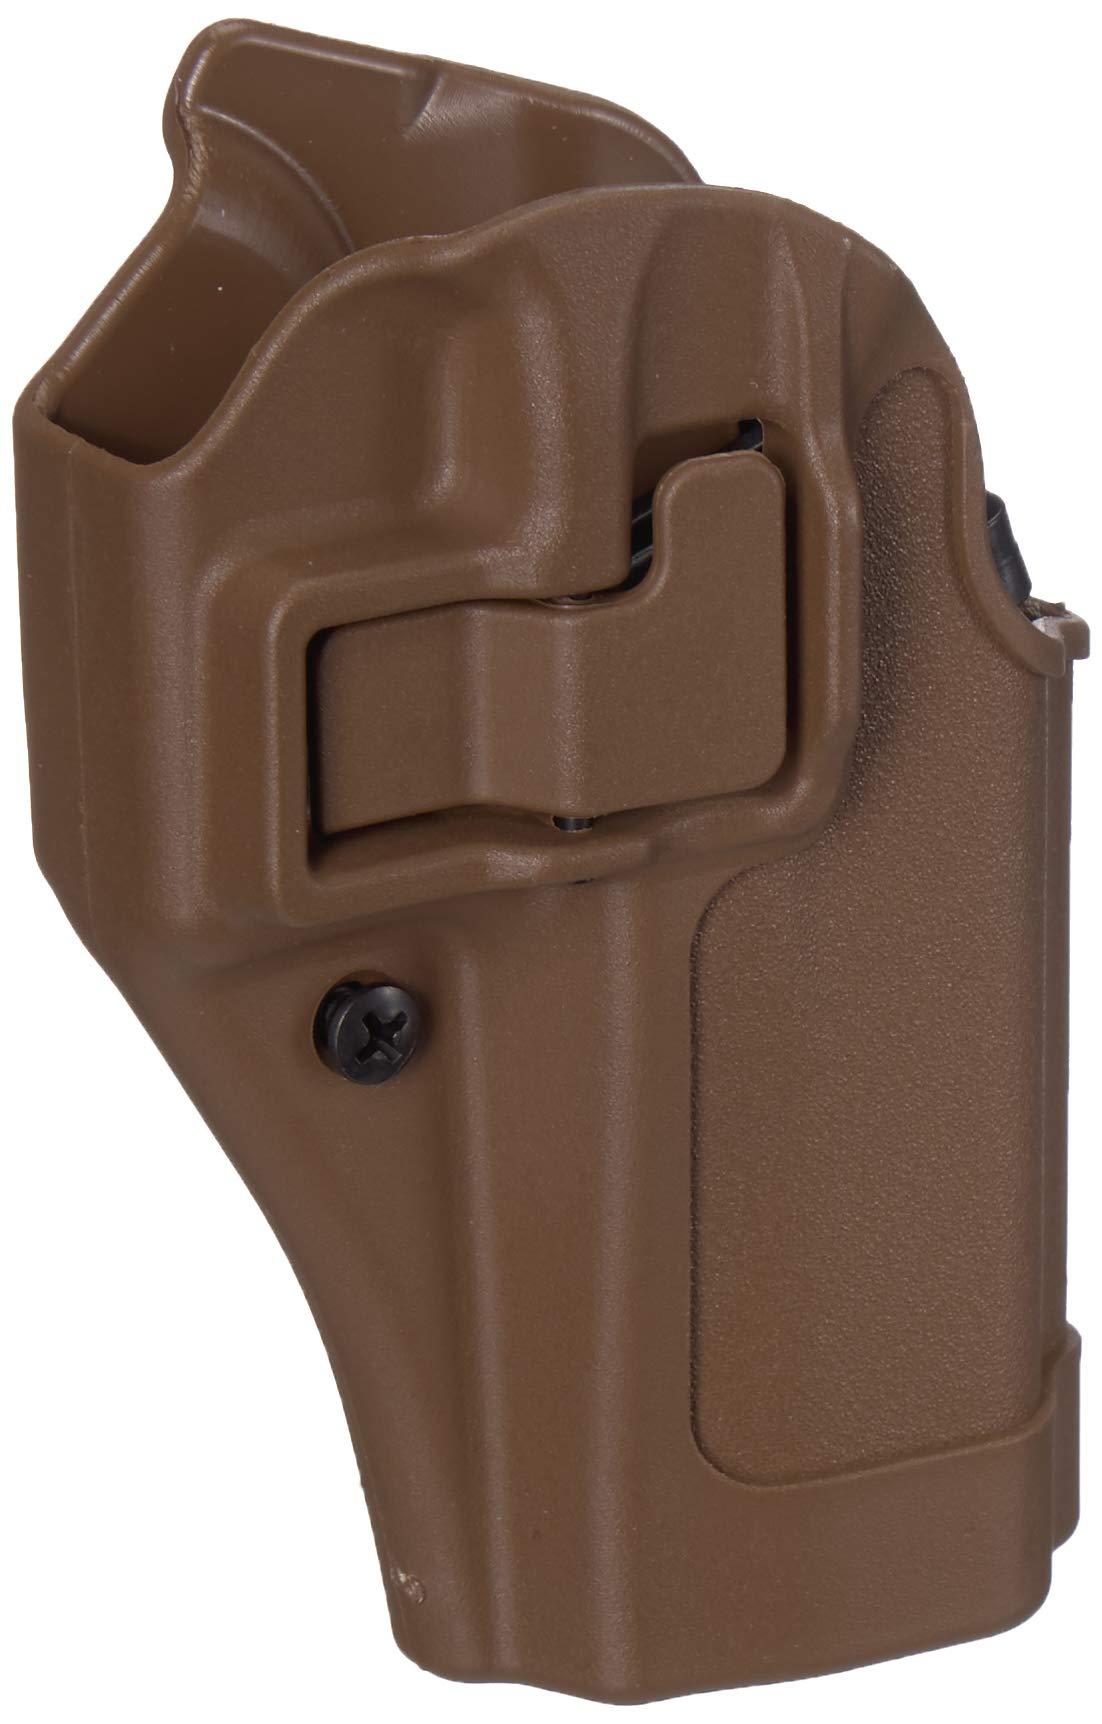 BlackHawk 410502BK-R Serpa CQC Concealment Holster Matte RH for Black Glock 19